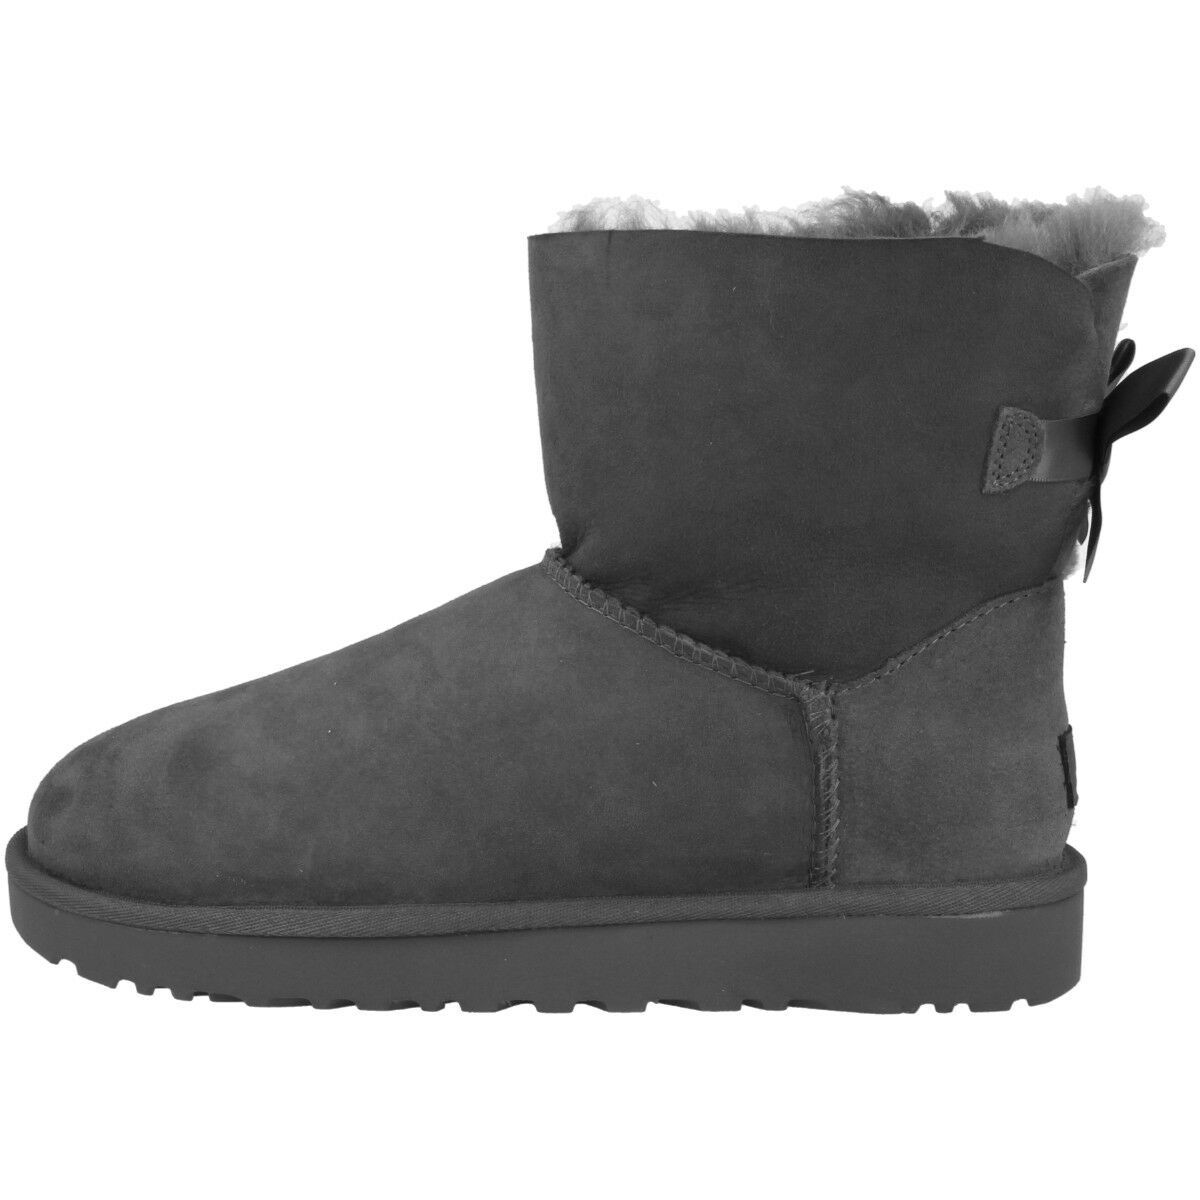 UGG Mini Bailey Bow II Boots Damen Stiefel Australia